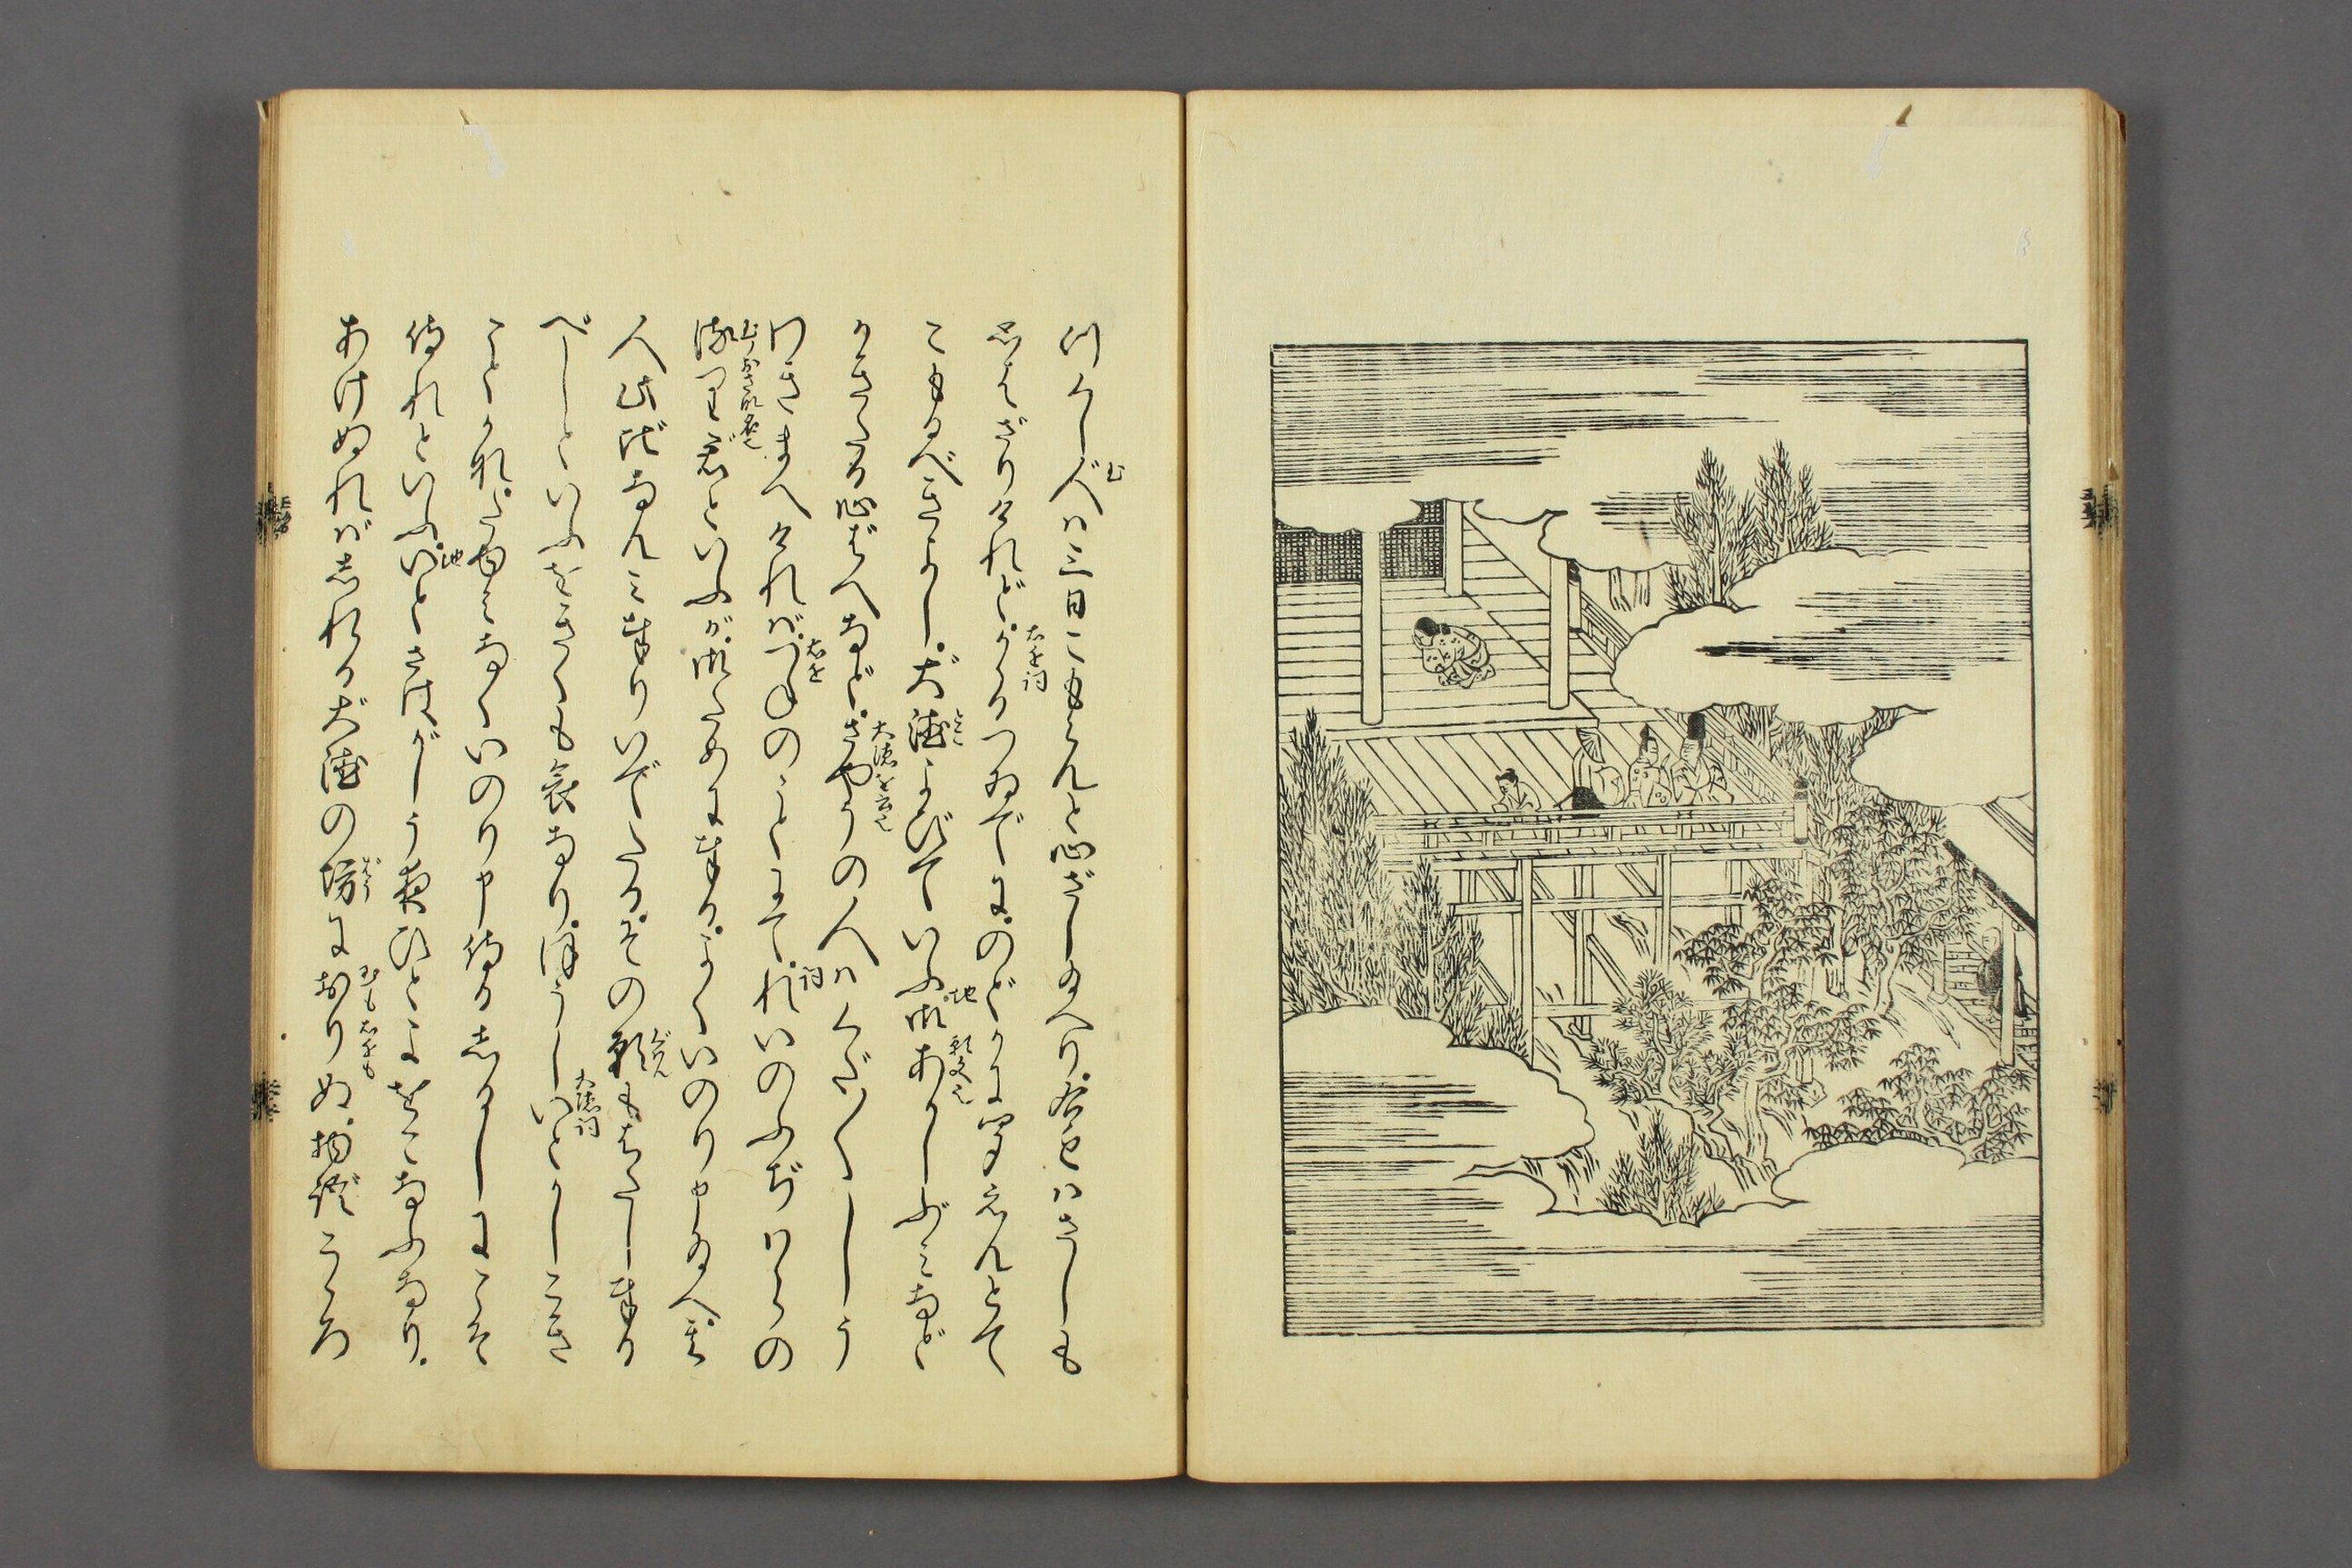 http://archive.wul.waseda.ac.jp/kosho/bunko30/bunko30_a0007/bunko30_a0007_0022/bunko30_a0007_0022_p0023.jpg